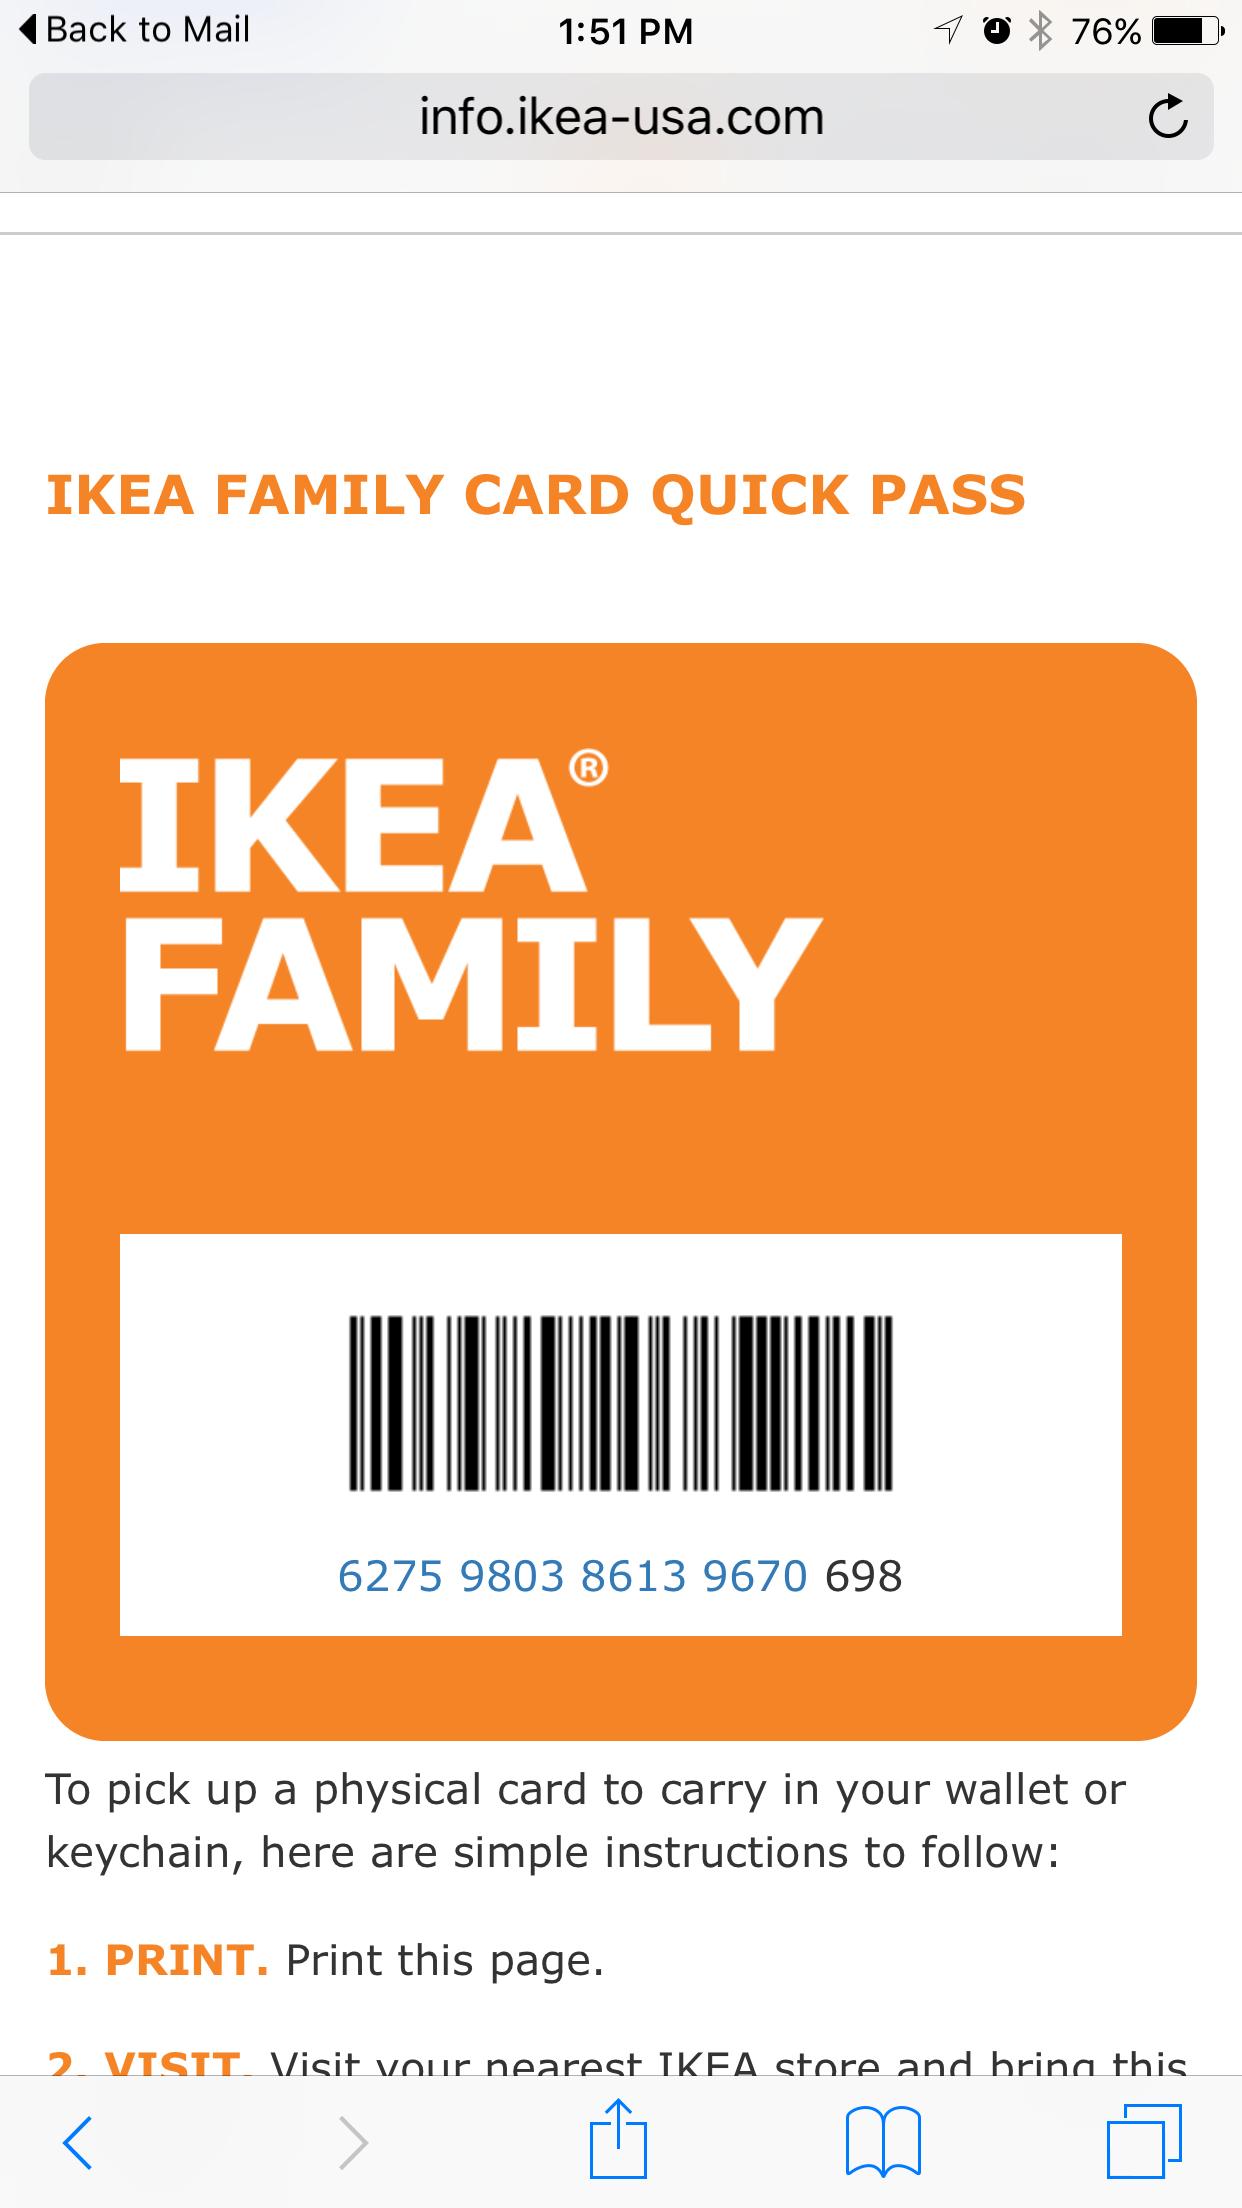 Schön Ikea Family Card Login Schema